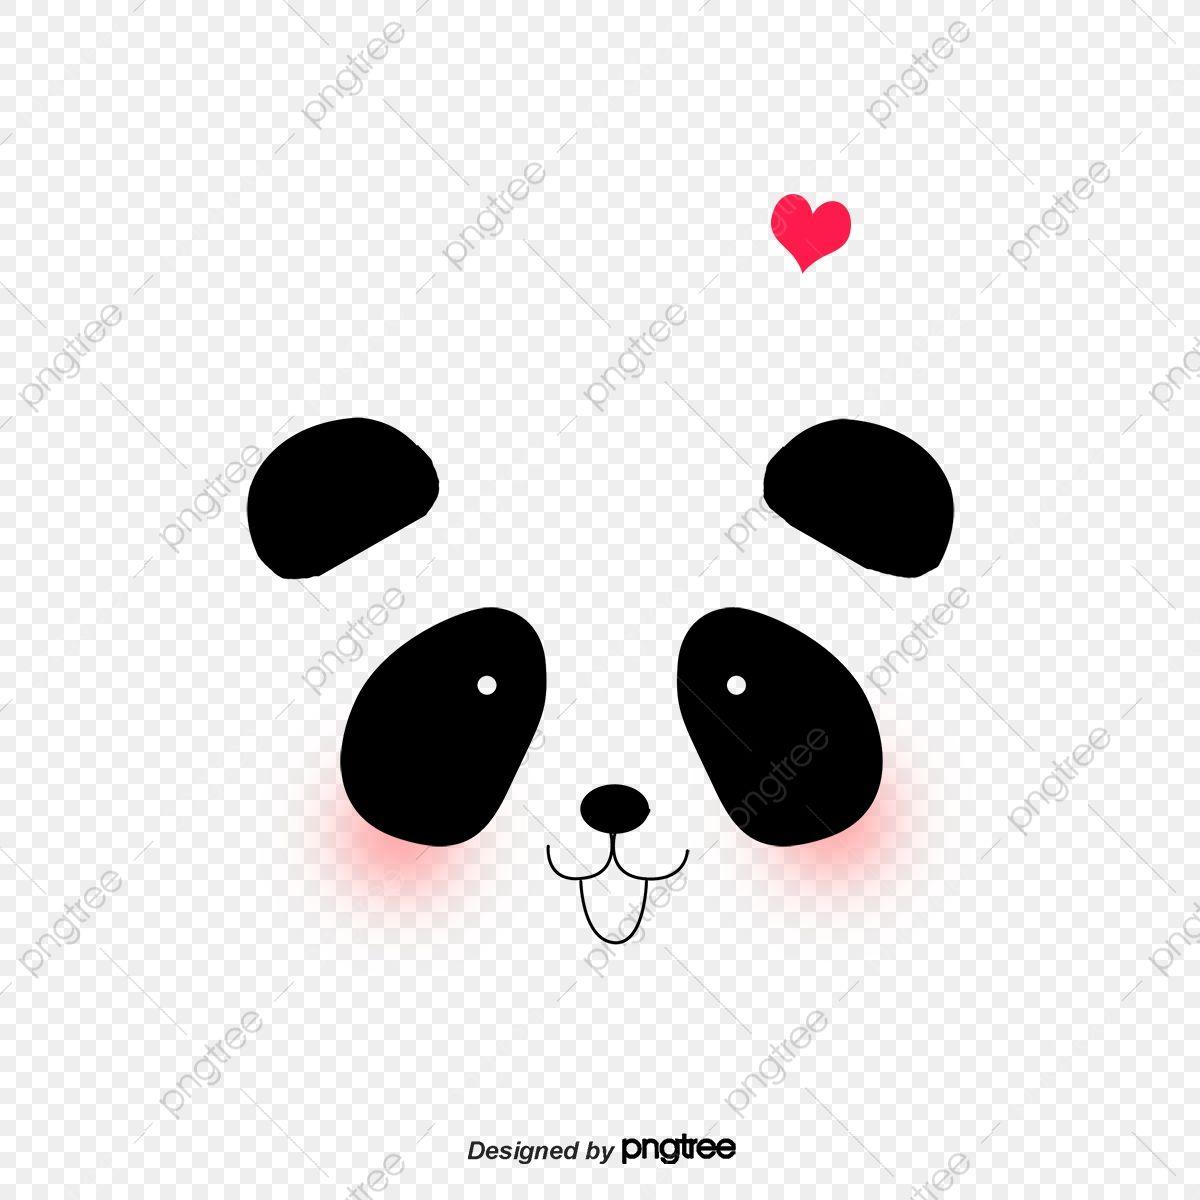 Panda Panda Clipart Hand Painted Panda Cartoon Panda Png Transparent Clipart Image And Psd File For Free Download Cartoon Panda Panda Kung Fu Panda